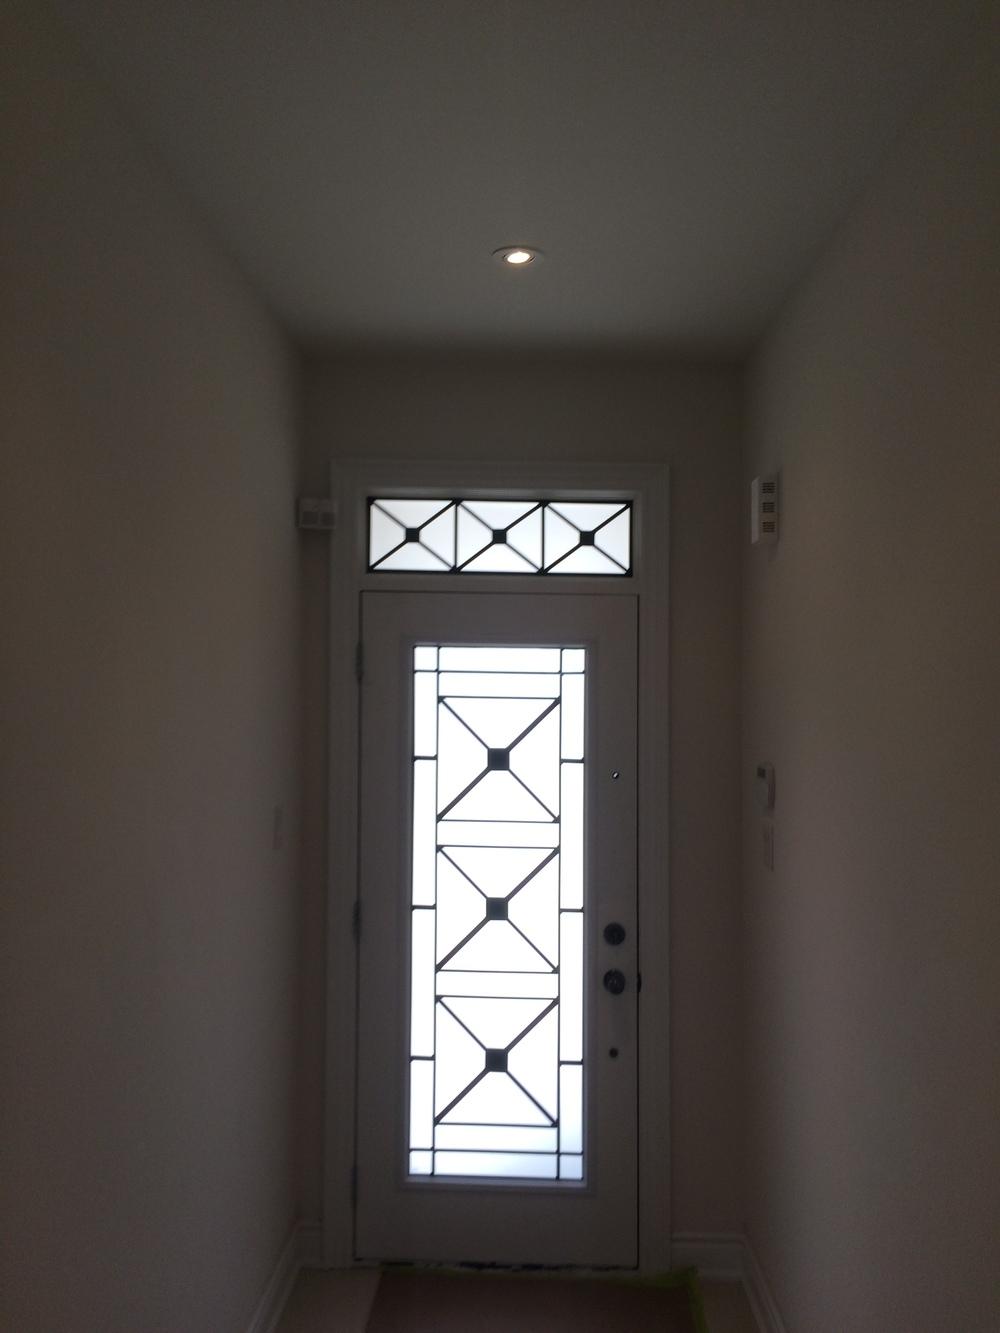 Century-Wrought-Iron-Glass-Door-Inserts-Aurora-Ontario